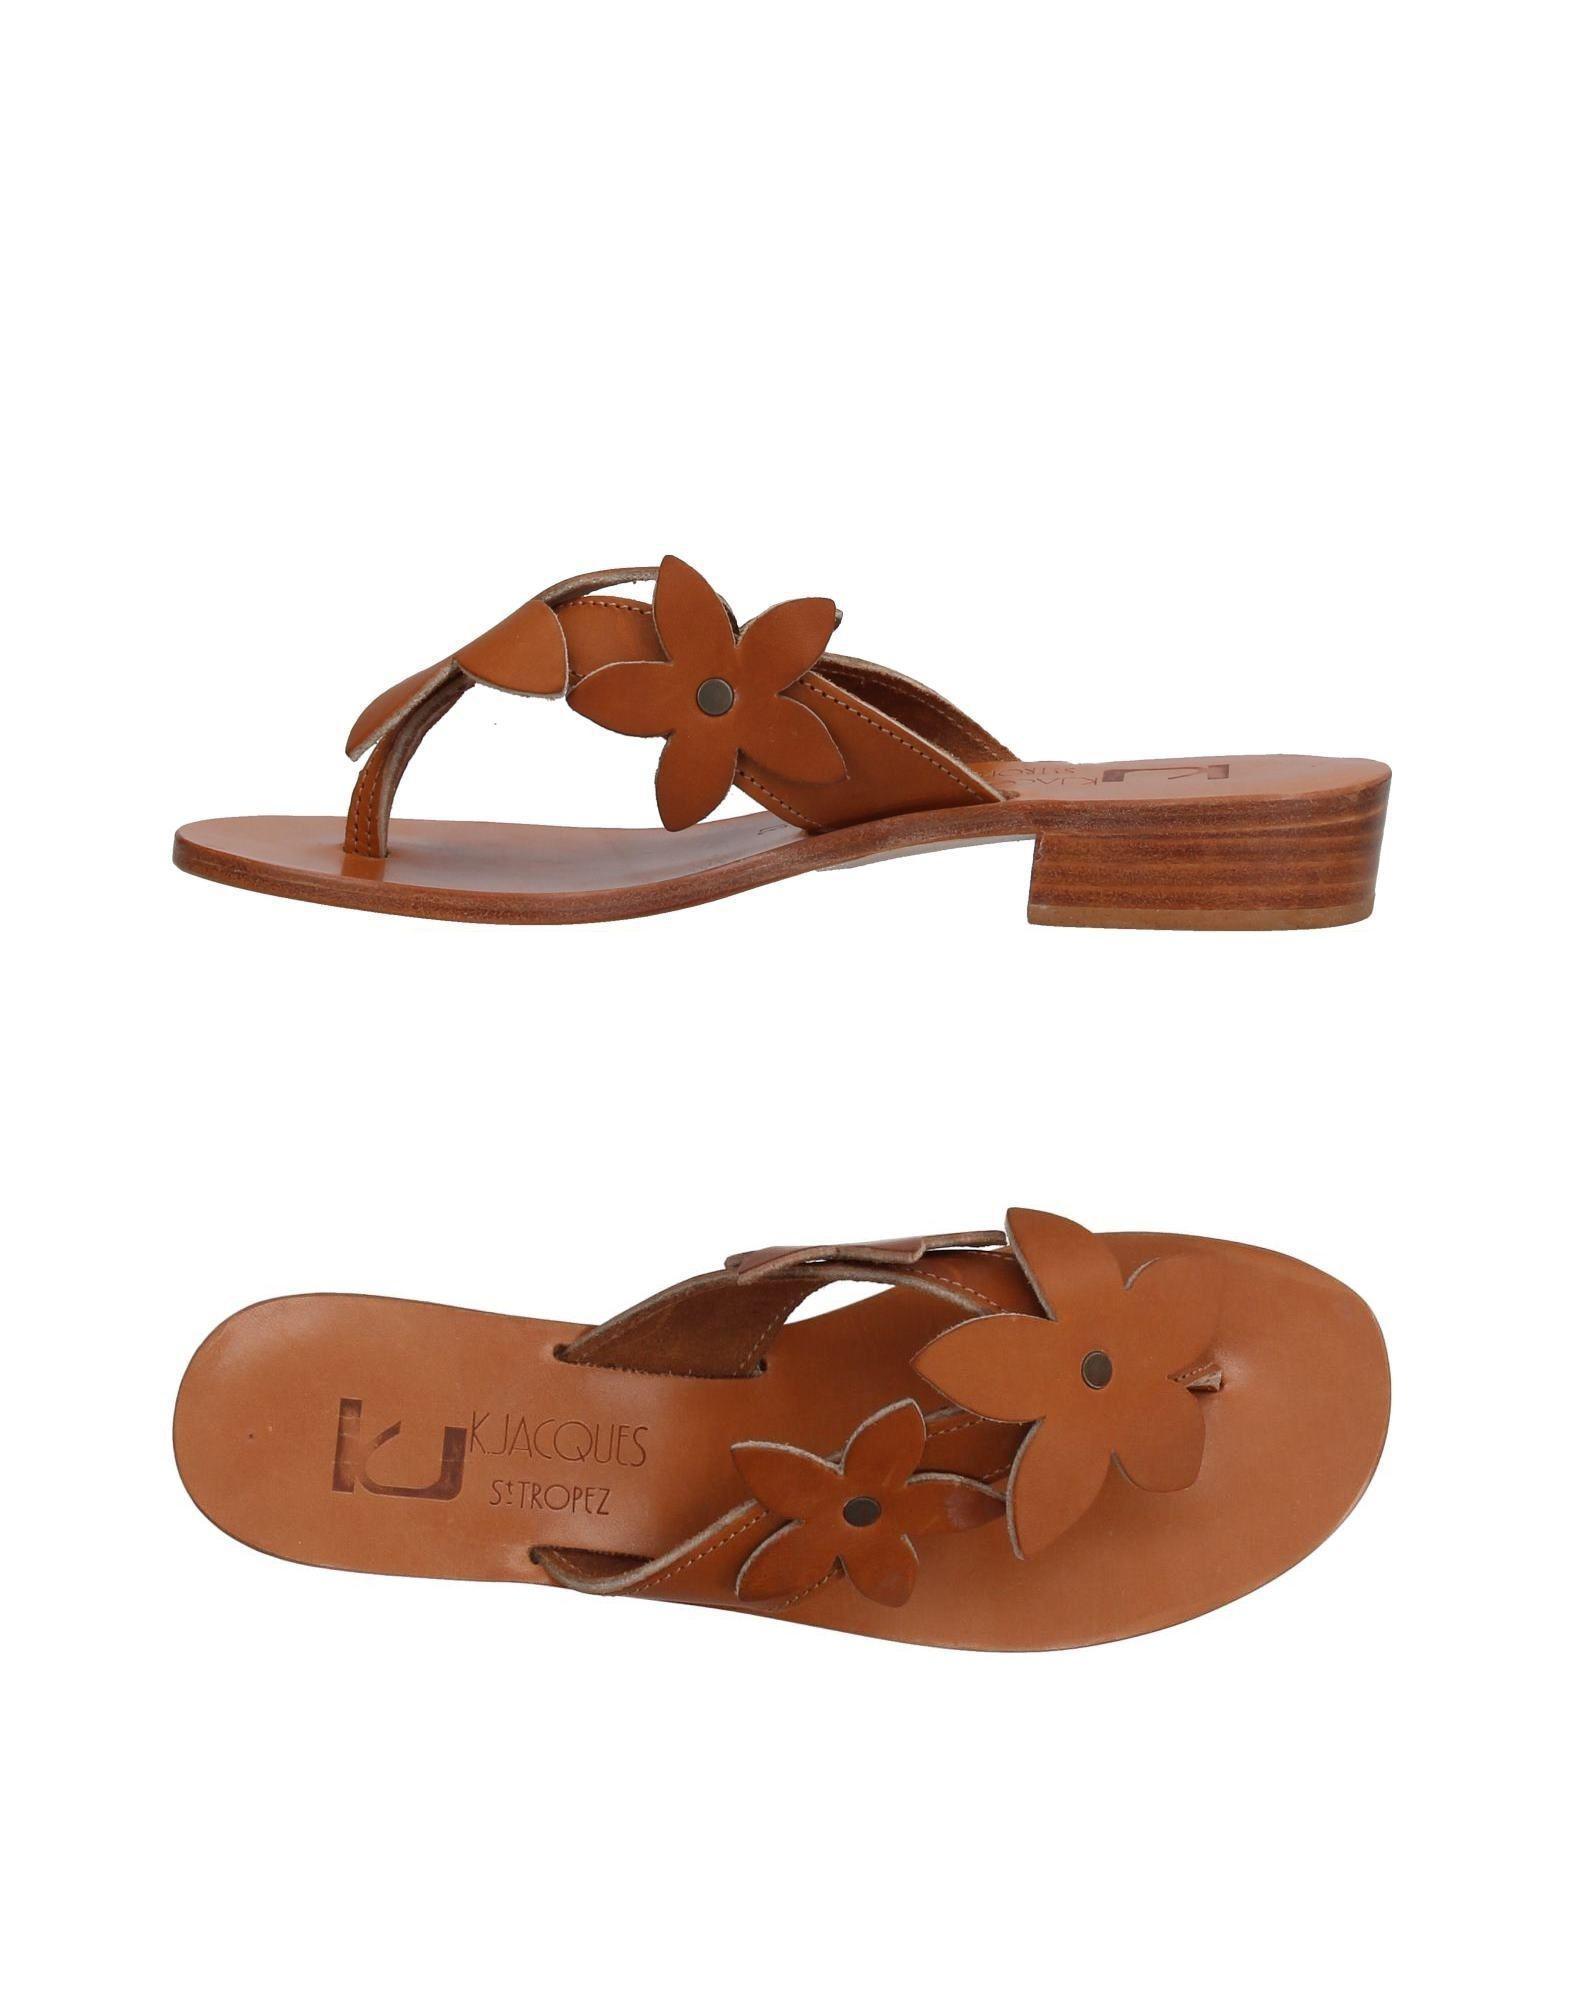 FOOTWEAR - Toe strap sandals on YOOX.COM K.Jacques qo3FCDsT